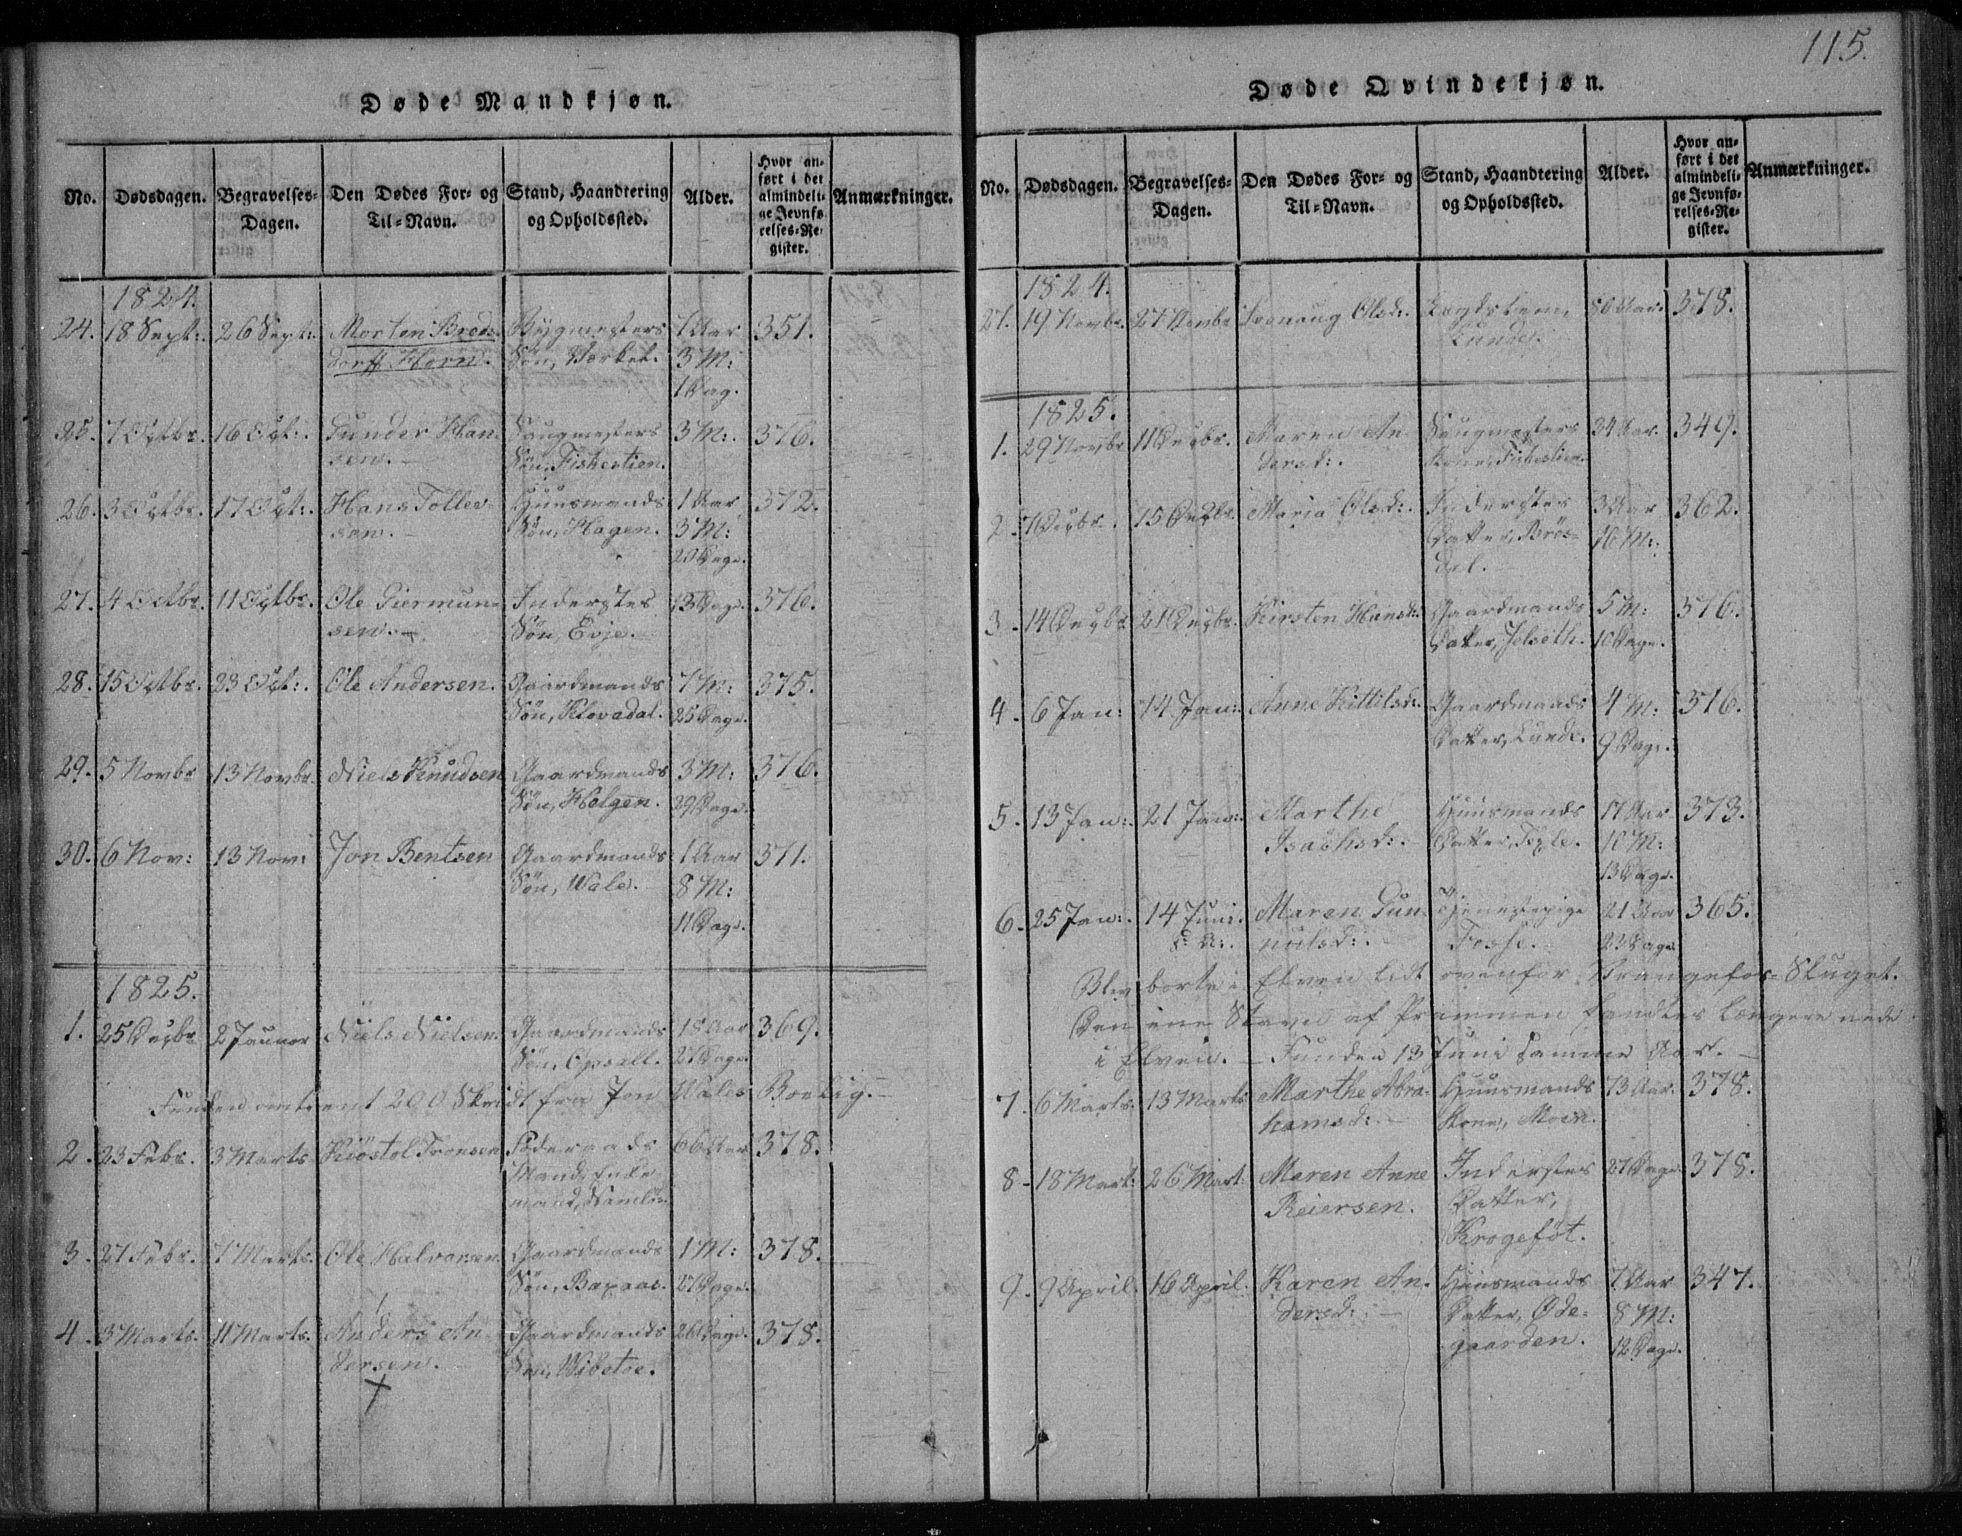 SAKO, Holla kirkebøker, F/Fa/L0003: Ministerialbok nr. 3, 1815-1830, s. 115